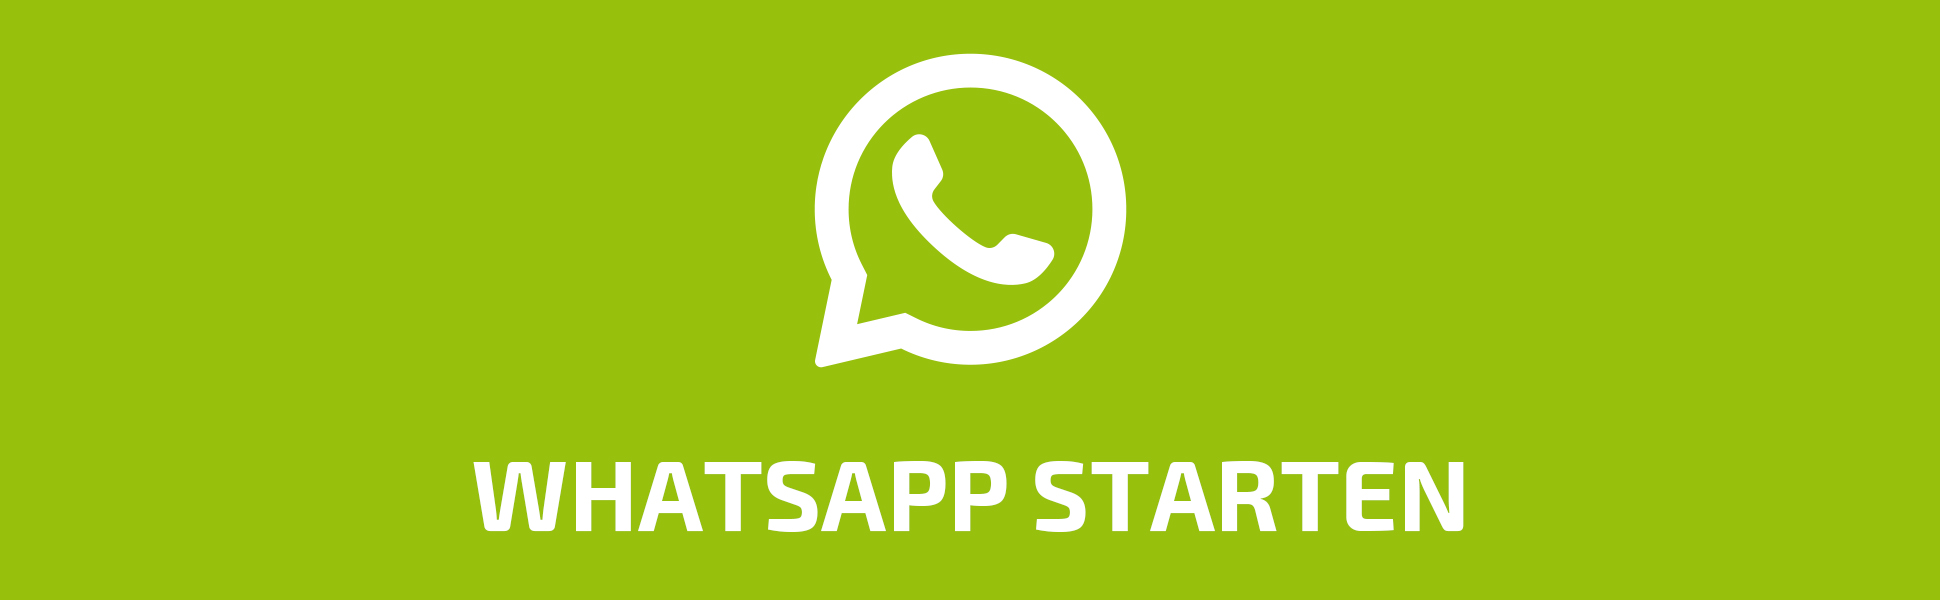 Whatsapp Starten